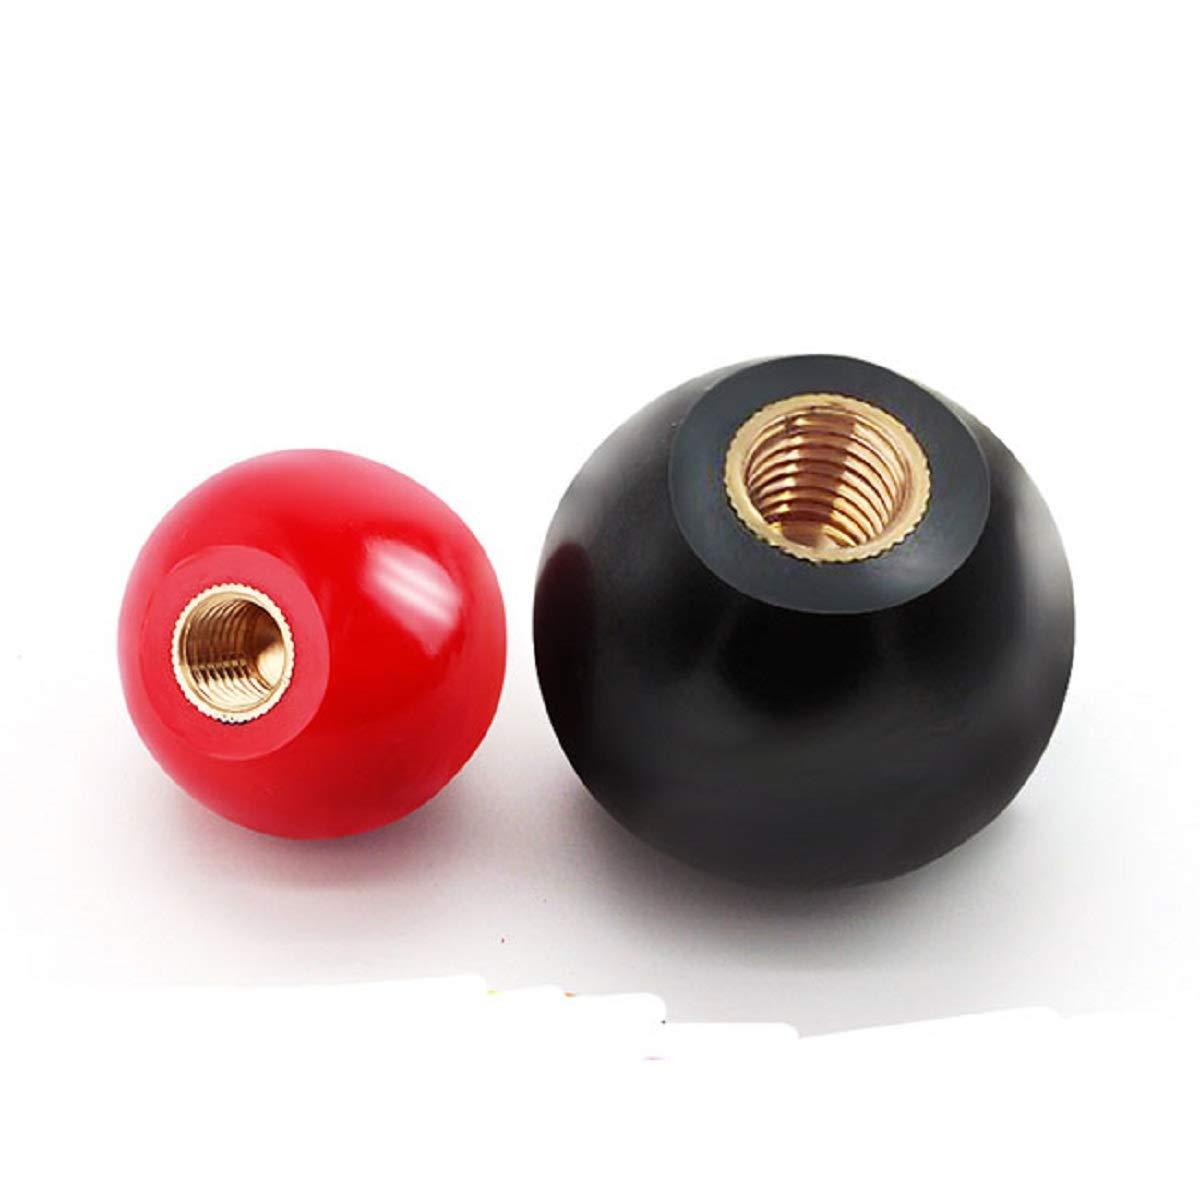 Select Size M5 M6 M8 M10 M12 M16 Handle Ball Knob Bakelite Ball Nut